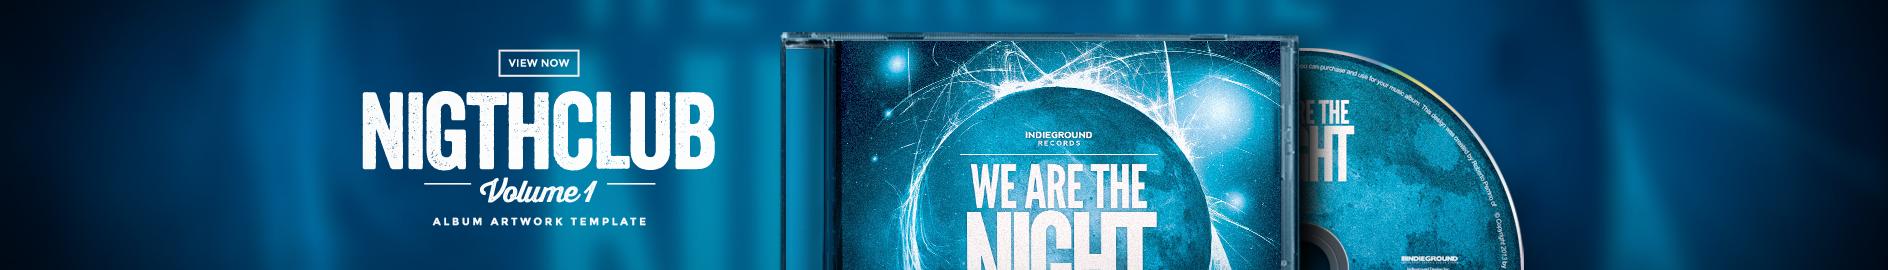 Slider_Album_NightclubVol1